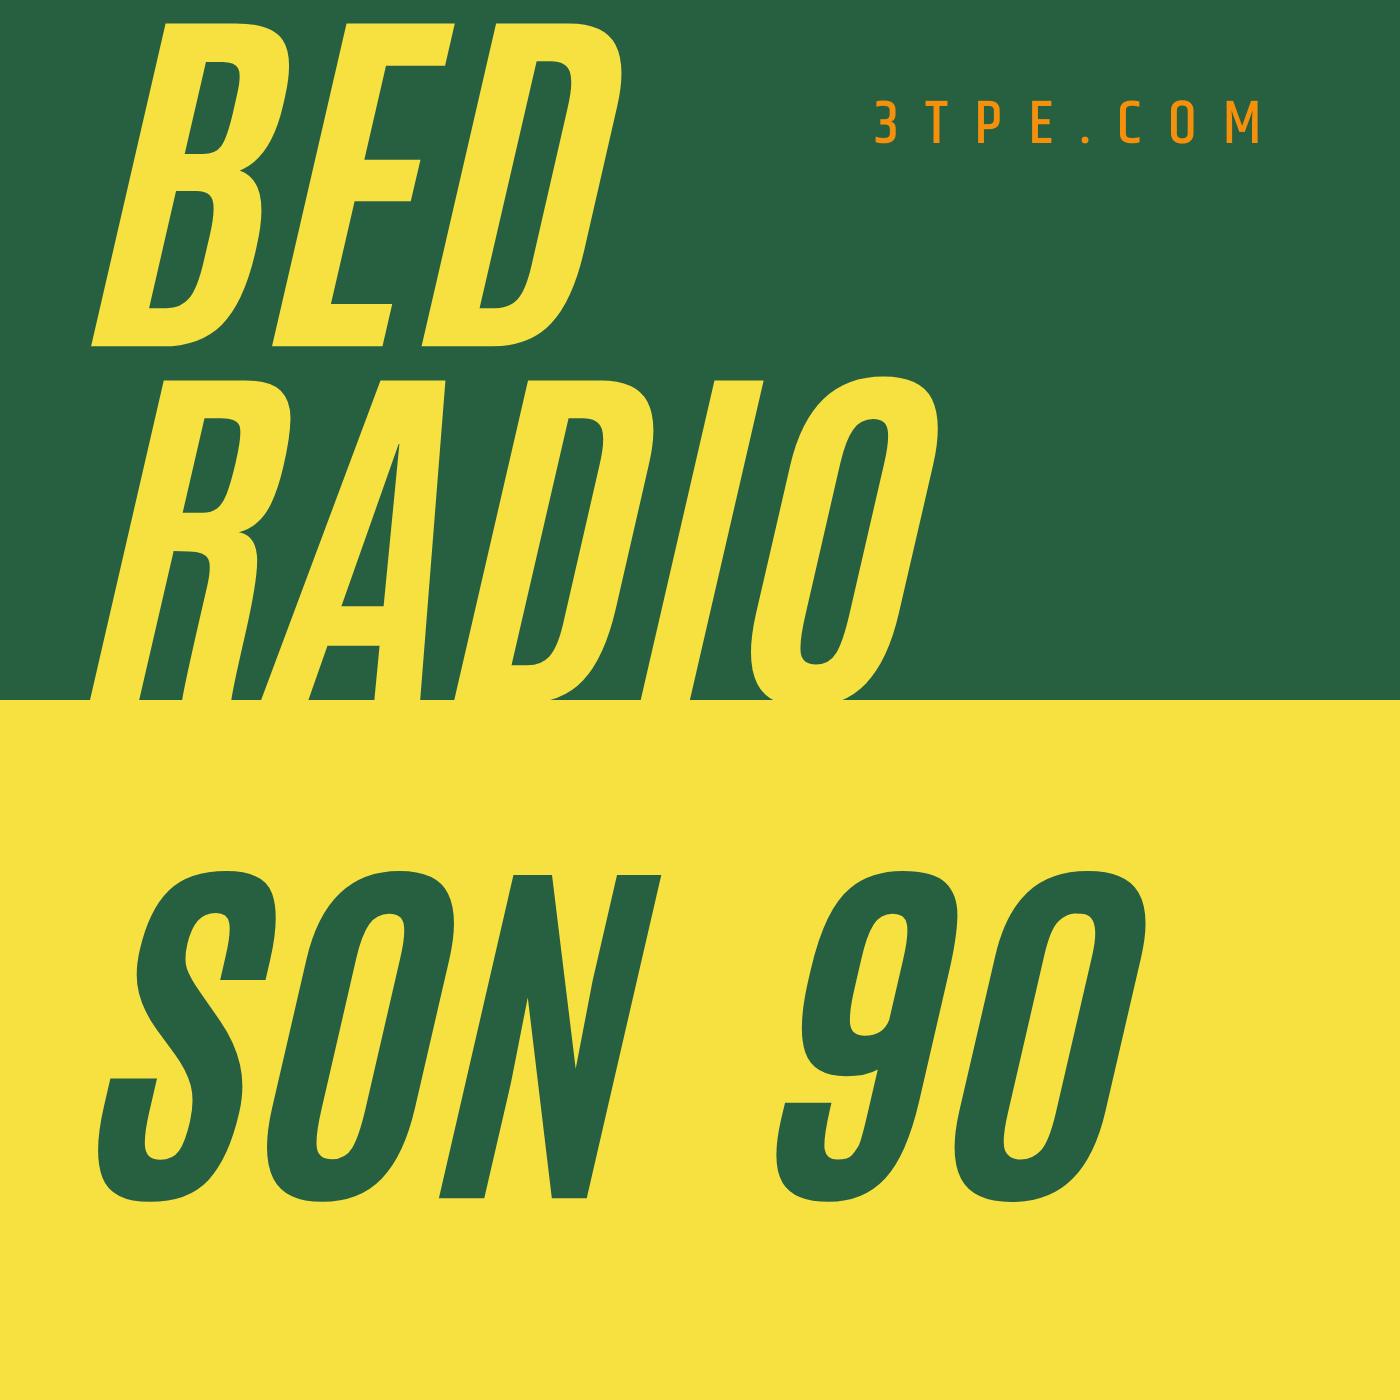 Bed radio année 90